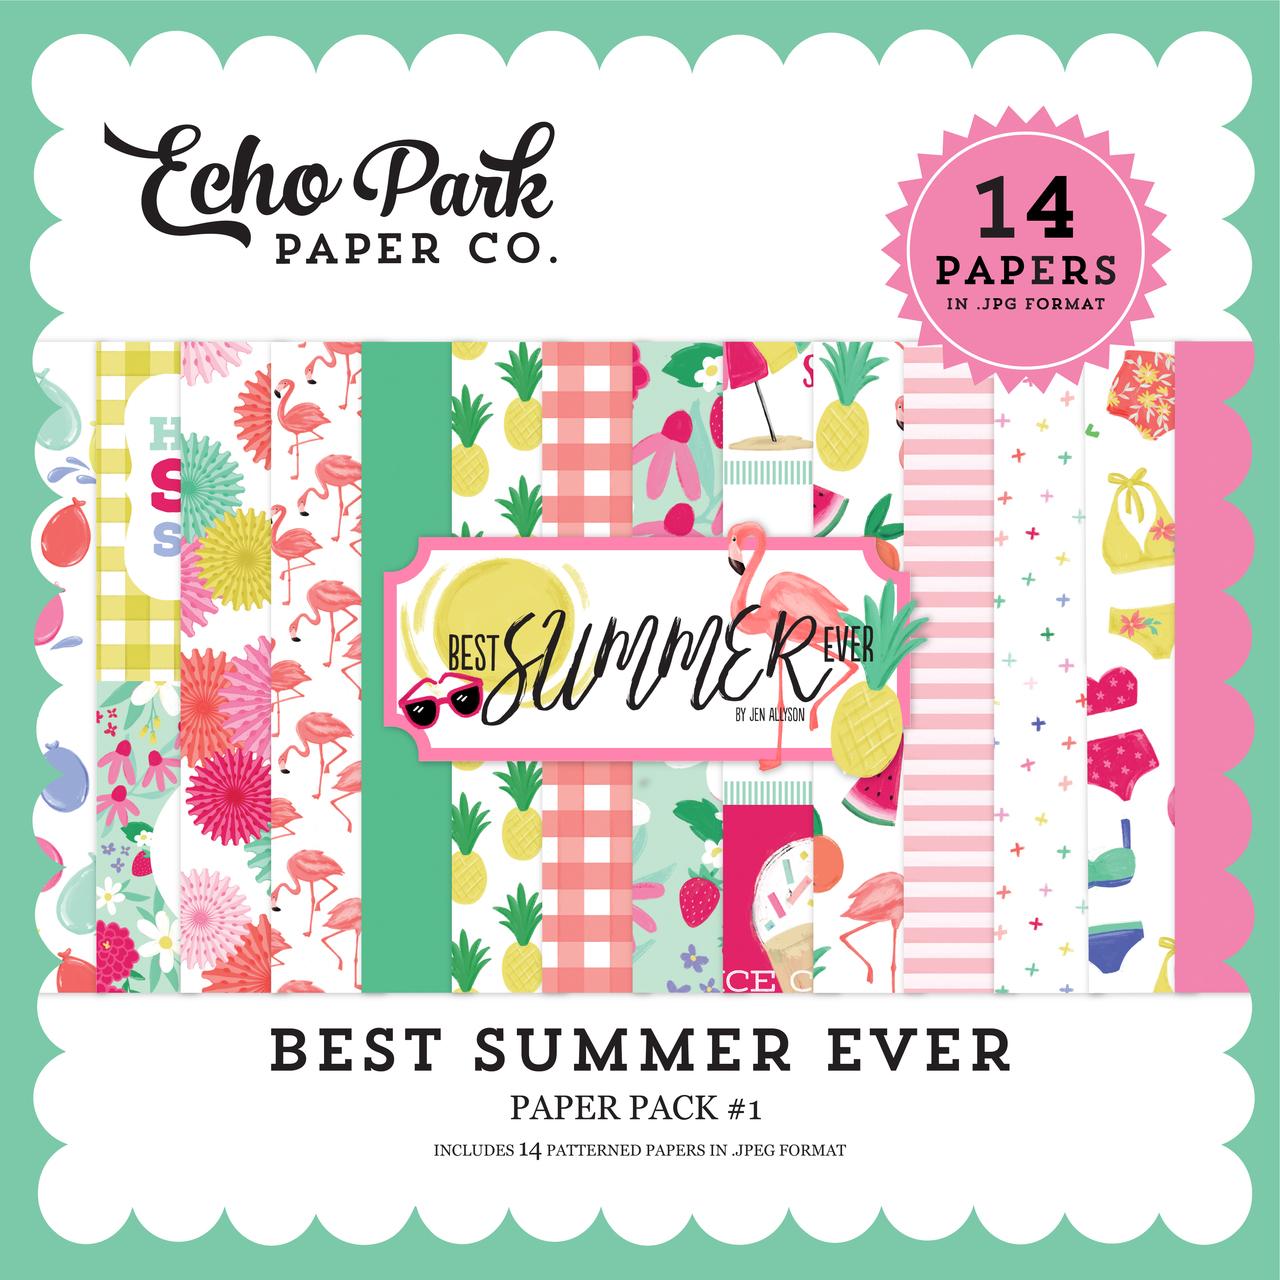 Best Summer Ever Paper Pack #1